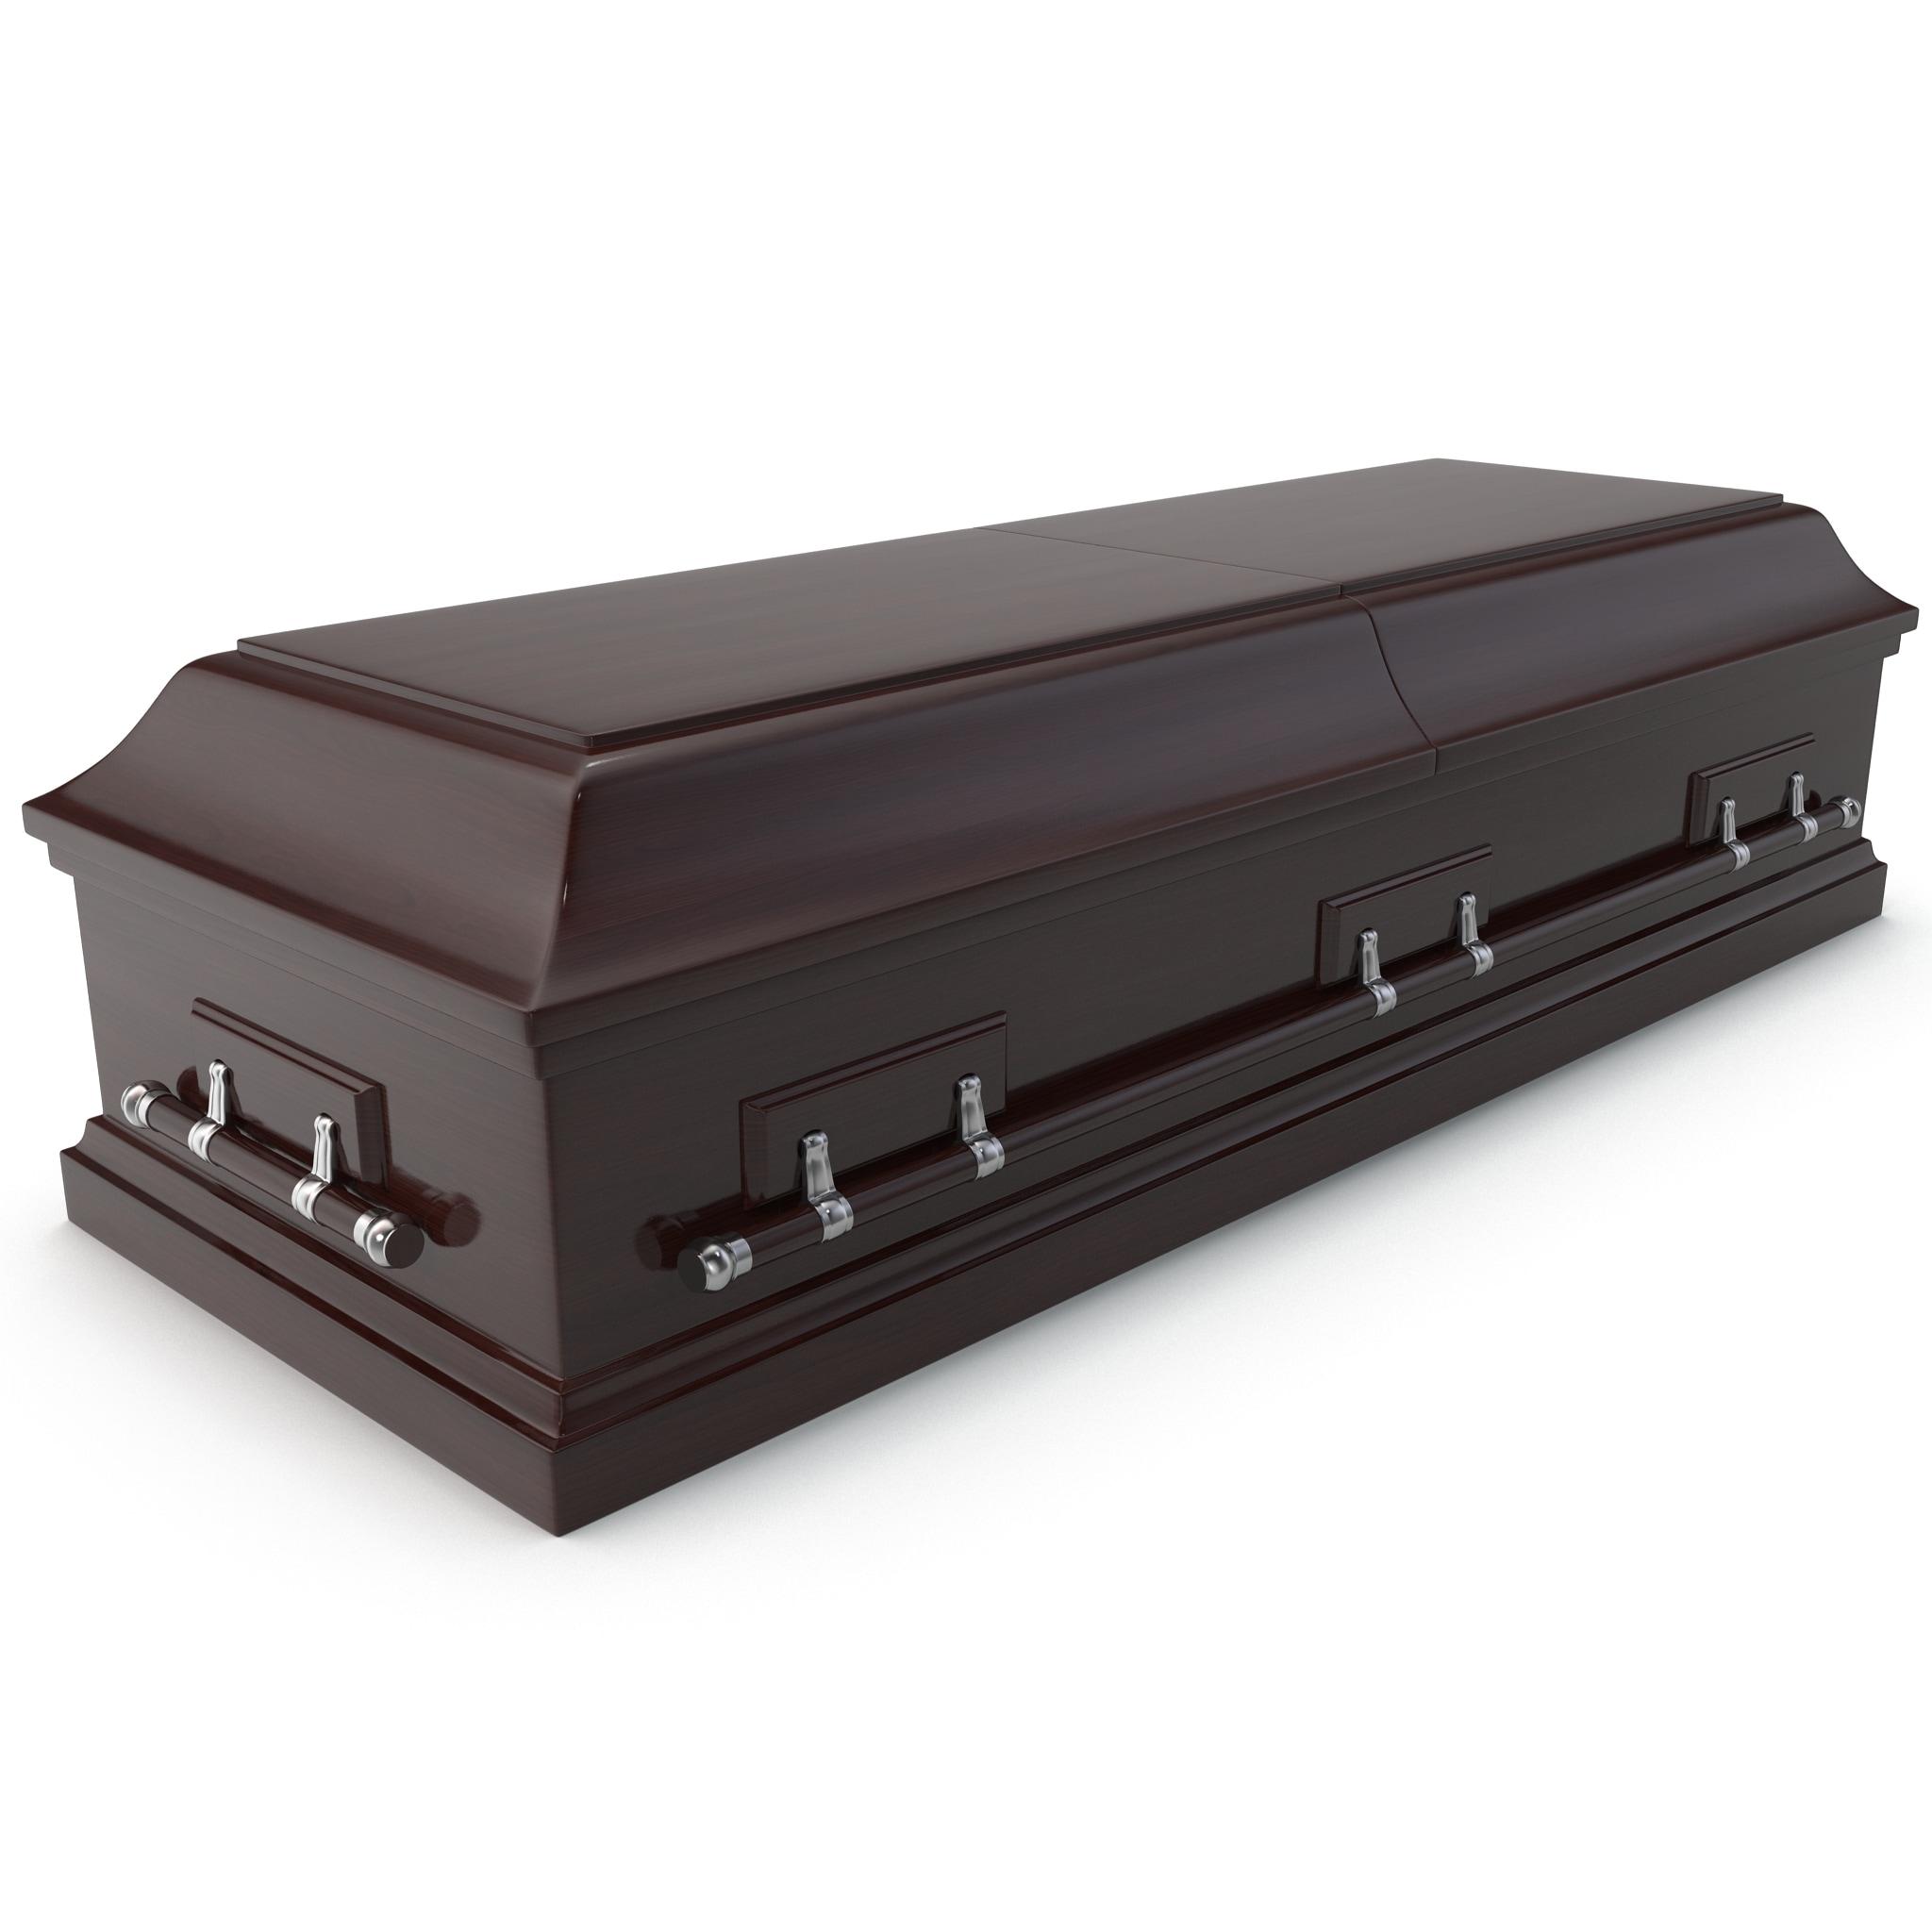 Coffin 2_2.jpg